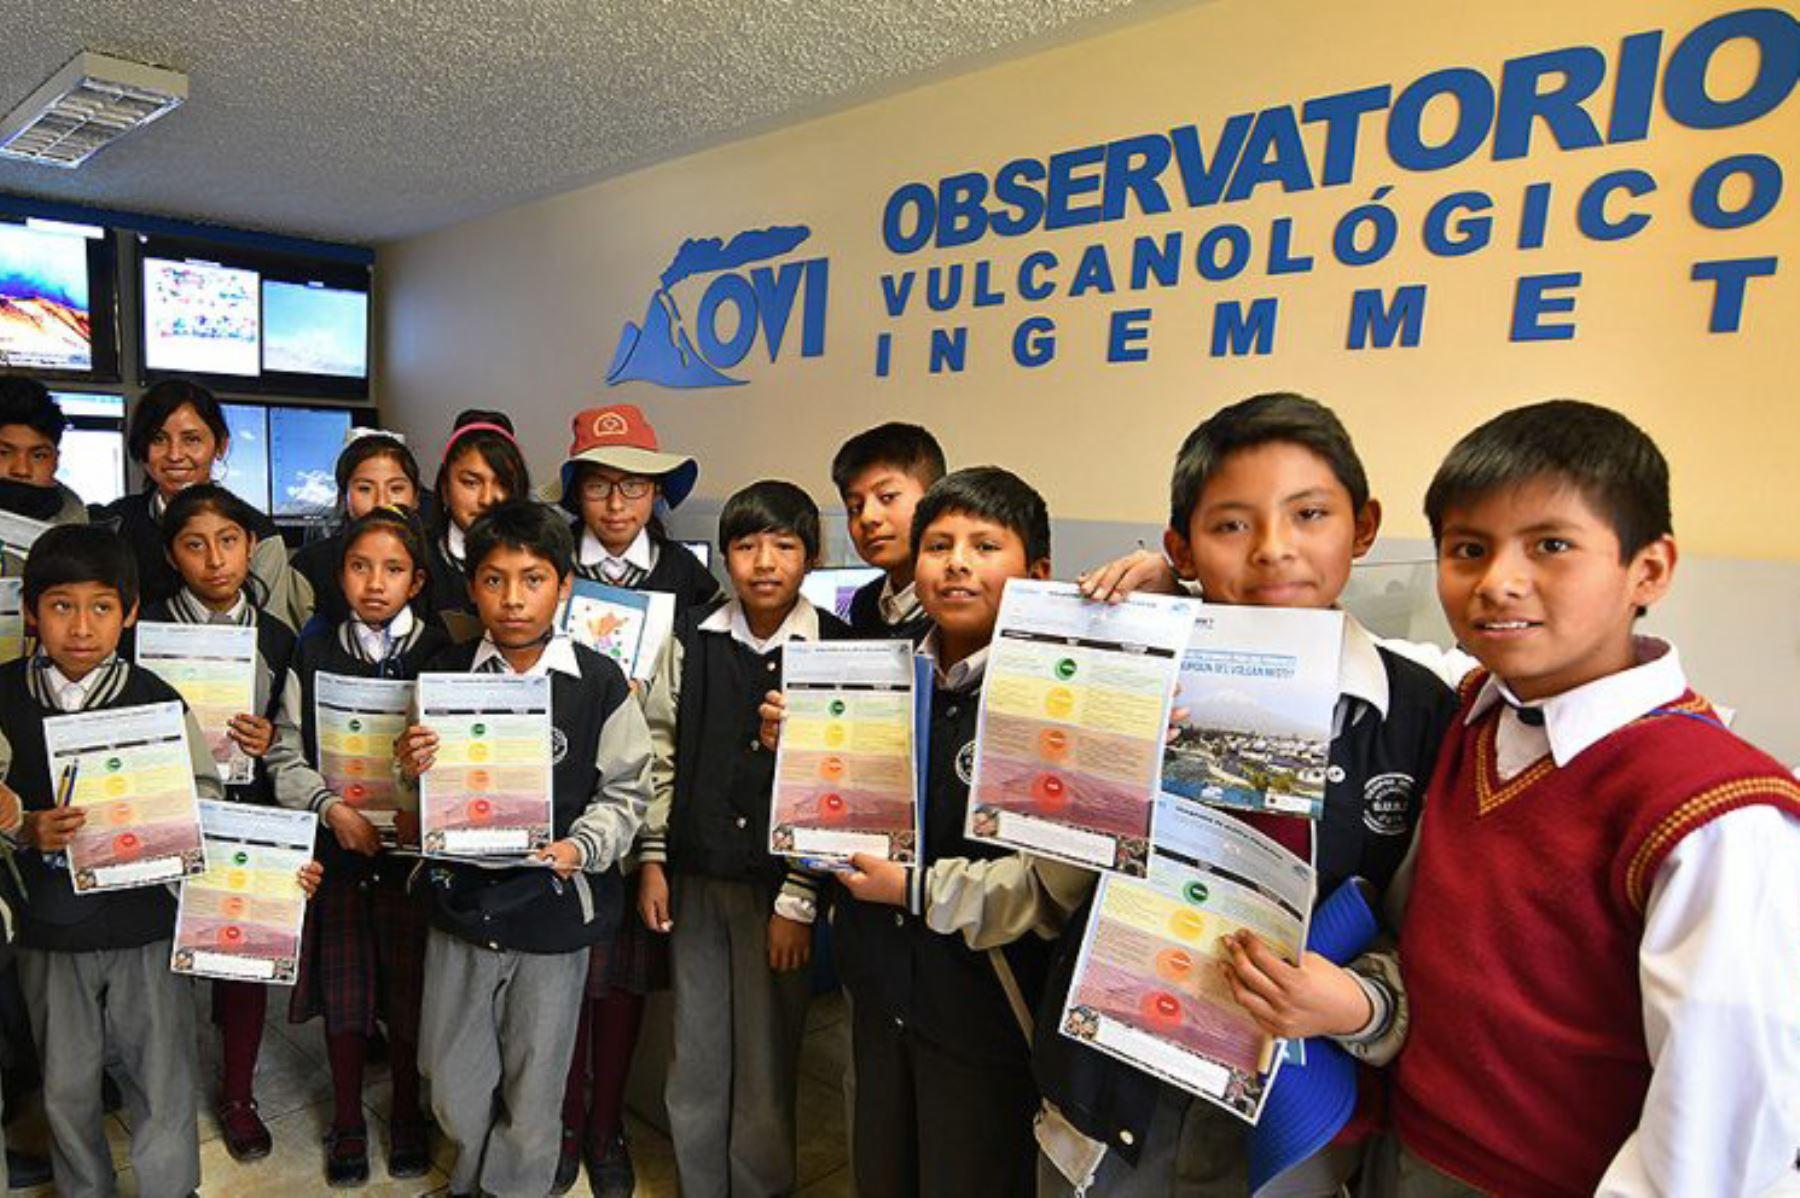 Arequipa: mapa interactivo del Misti da a conocer zonas de peligro volcánico